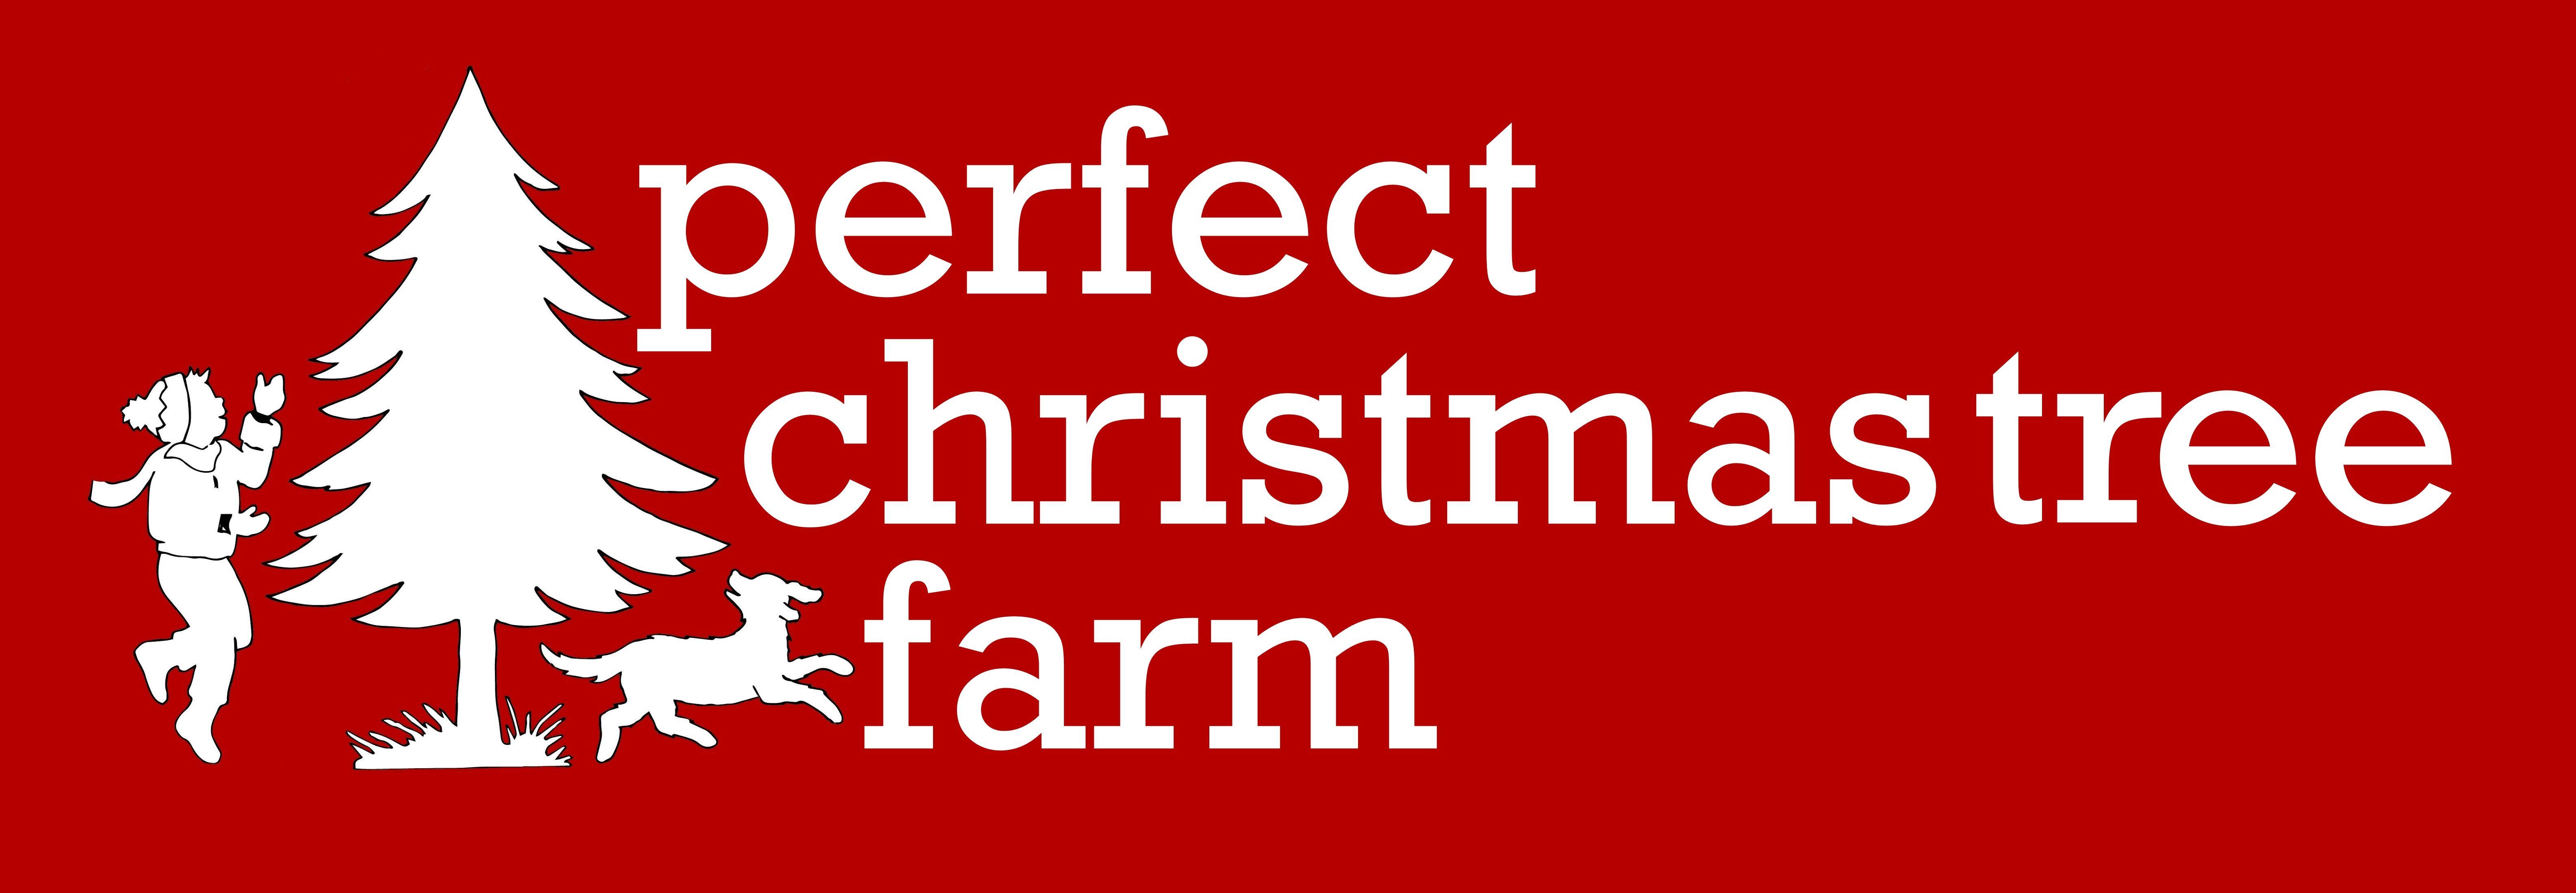 Christmas Tree Farm Logo.3 2 Christmas Tree Logo Med Wider 2 Perfect Christmas Tree